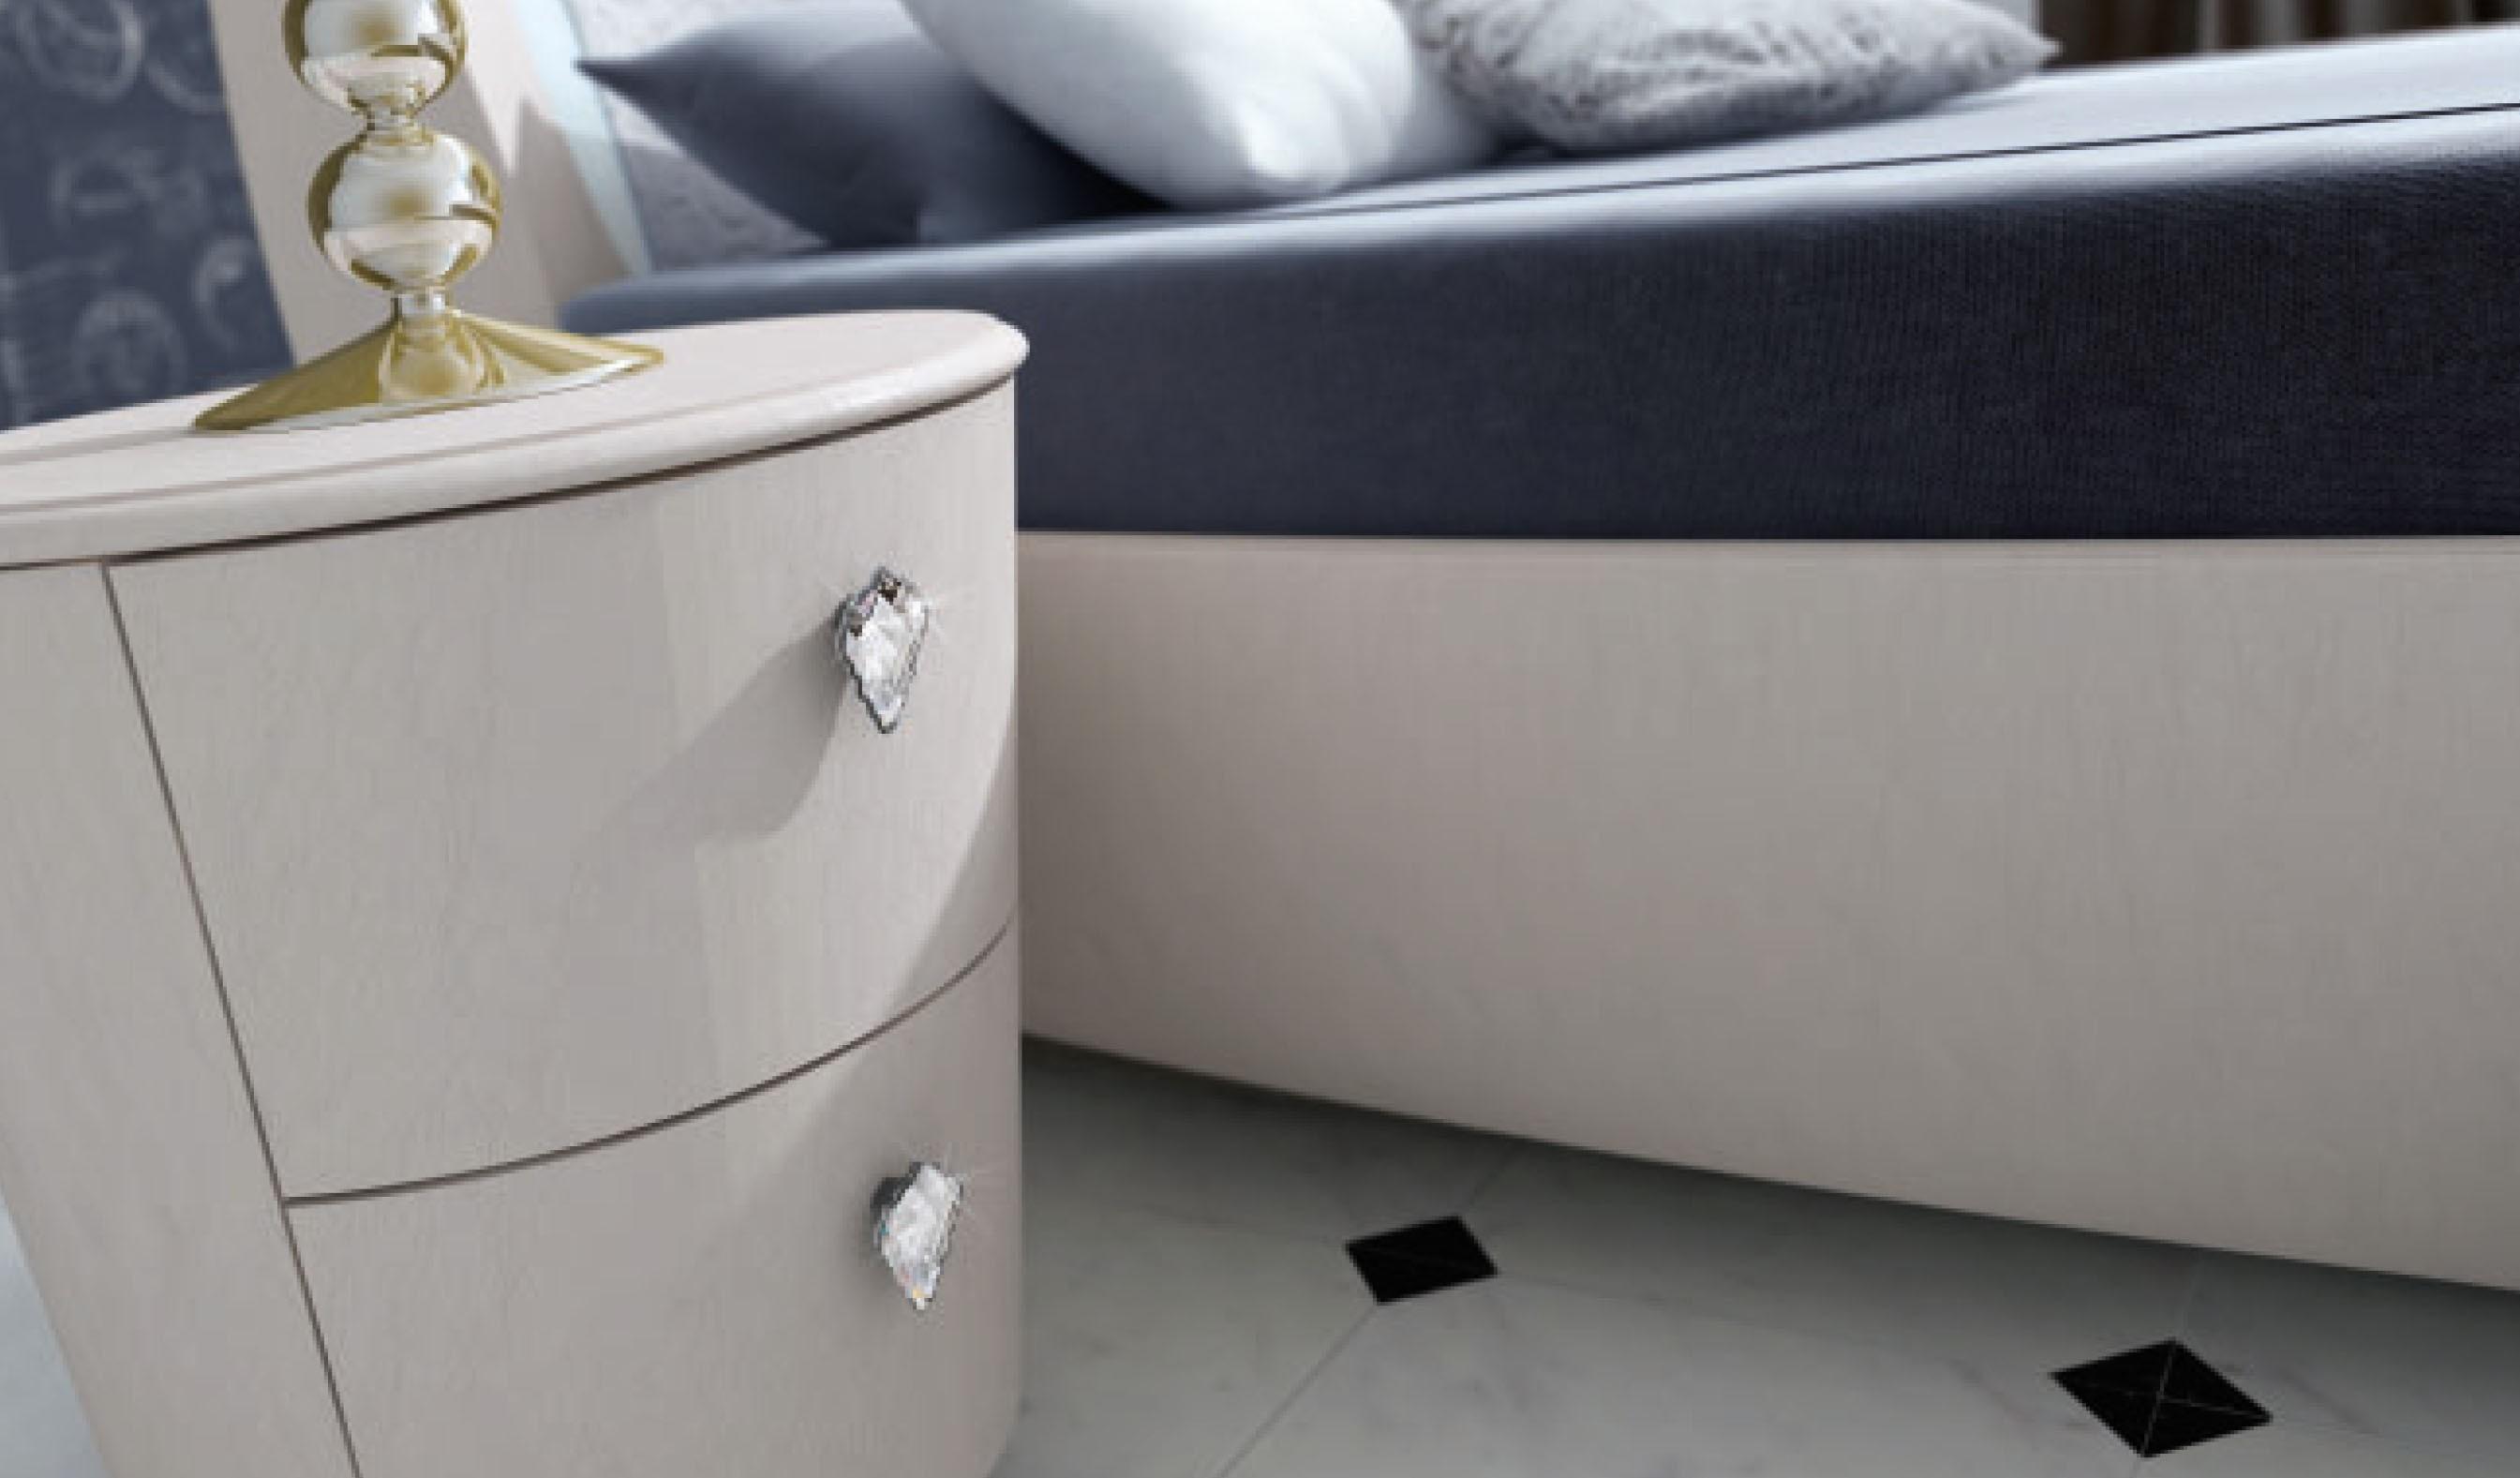 Boutons de meubles stone dolls ocean 39 s woodllv for for Poignee meuble salle de bain